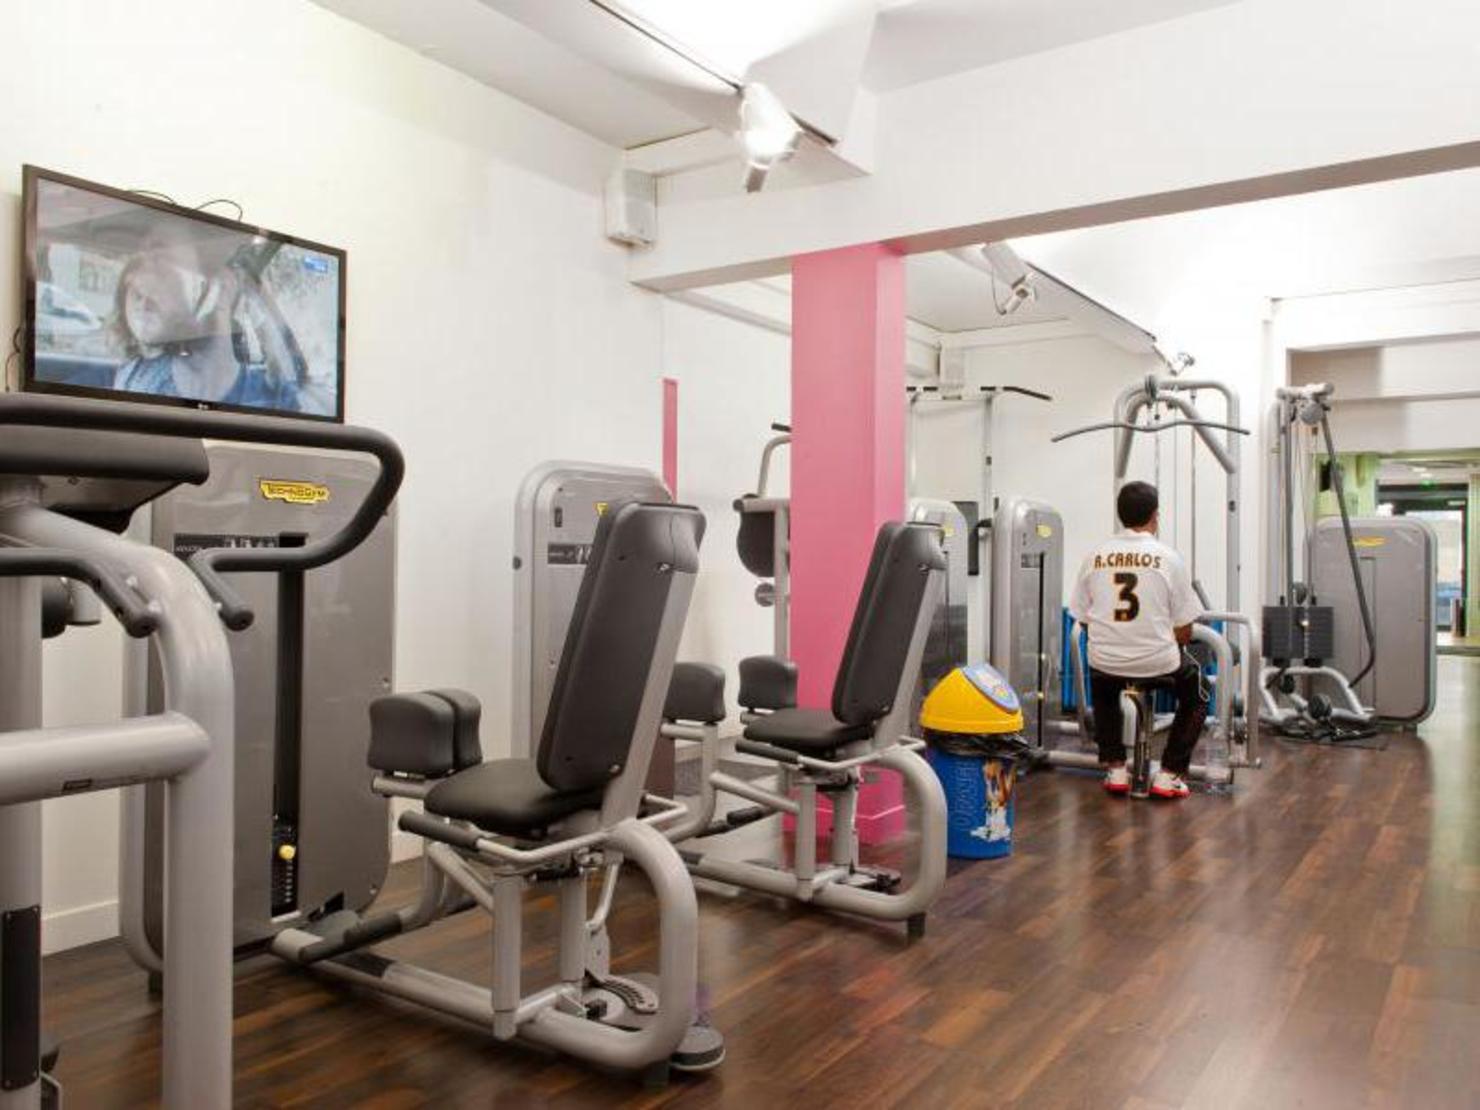 Fitness story herblay tarifs avis 28 images fitness for Kreabel tourcoing horaire